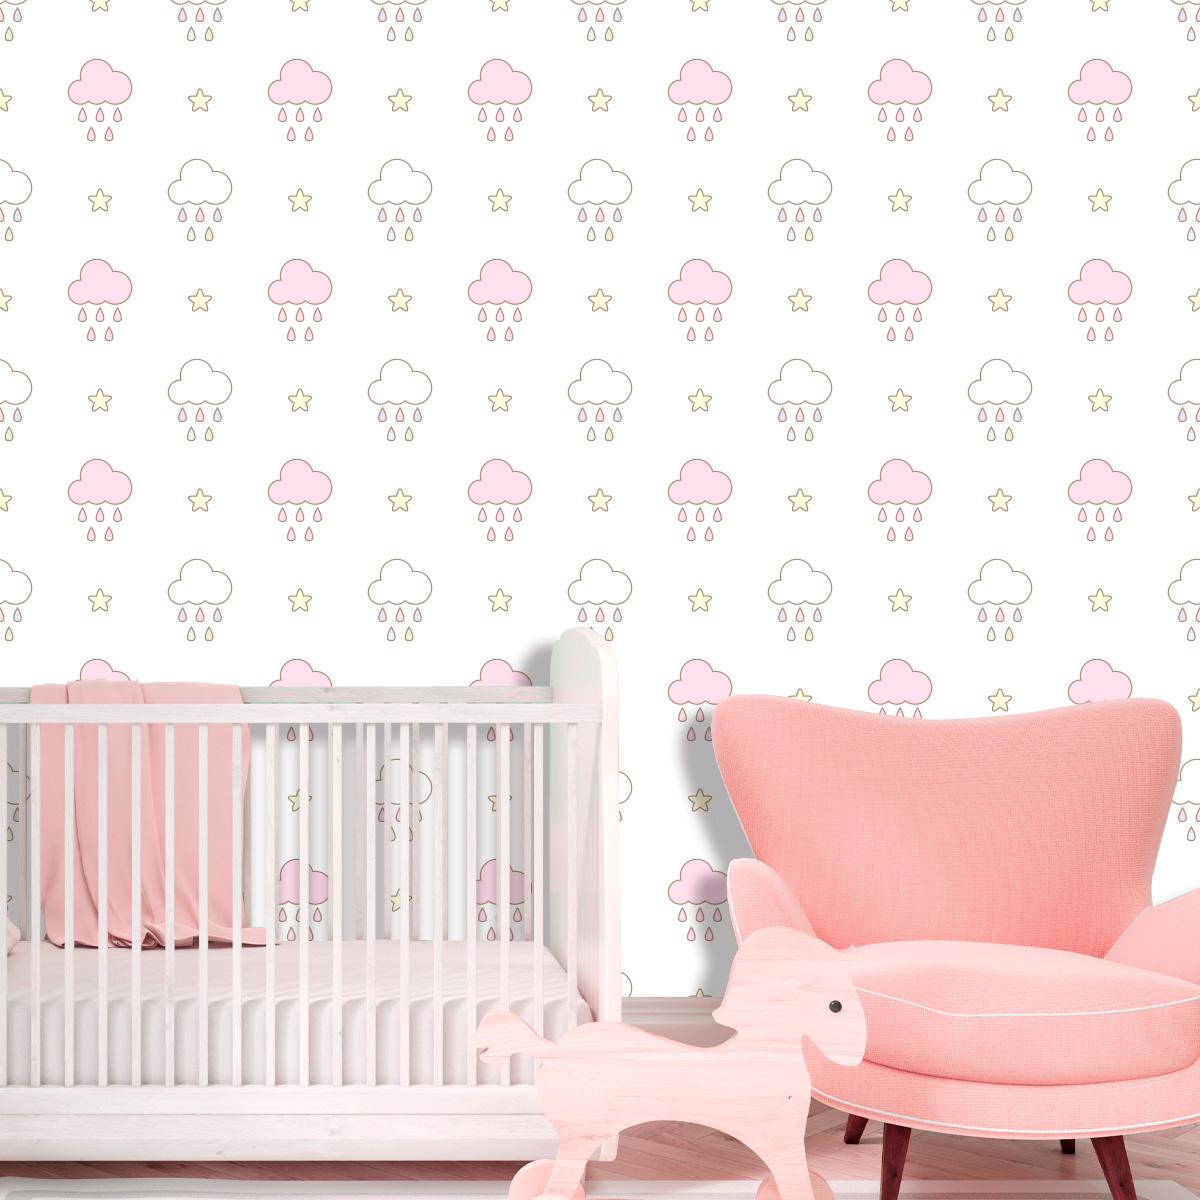 Papel de Parede Nuvens Chuva Estrelas Bebê Adesivo